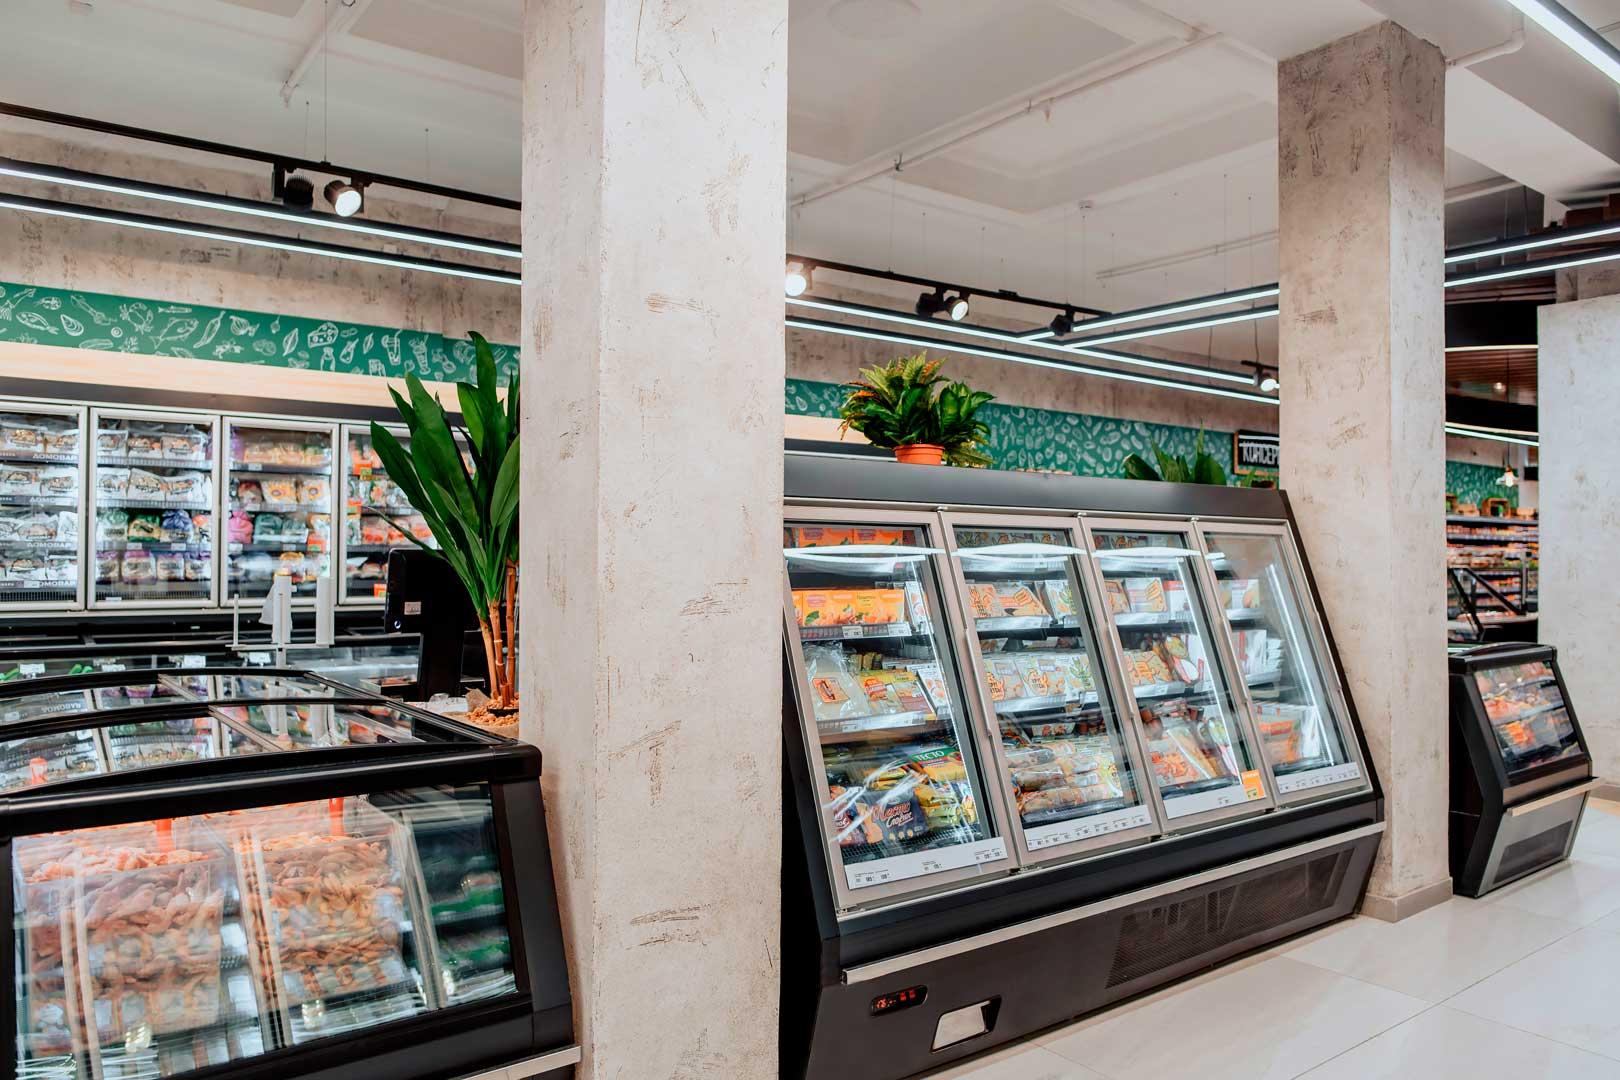 Frozen foods units Indiana eco ASV 100 LT D 160-DLA